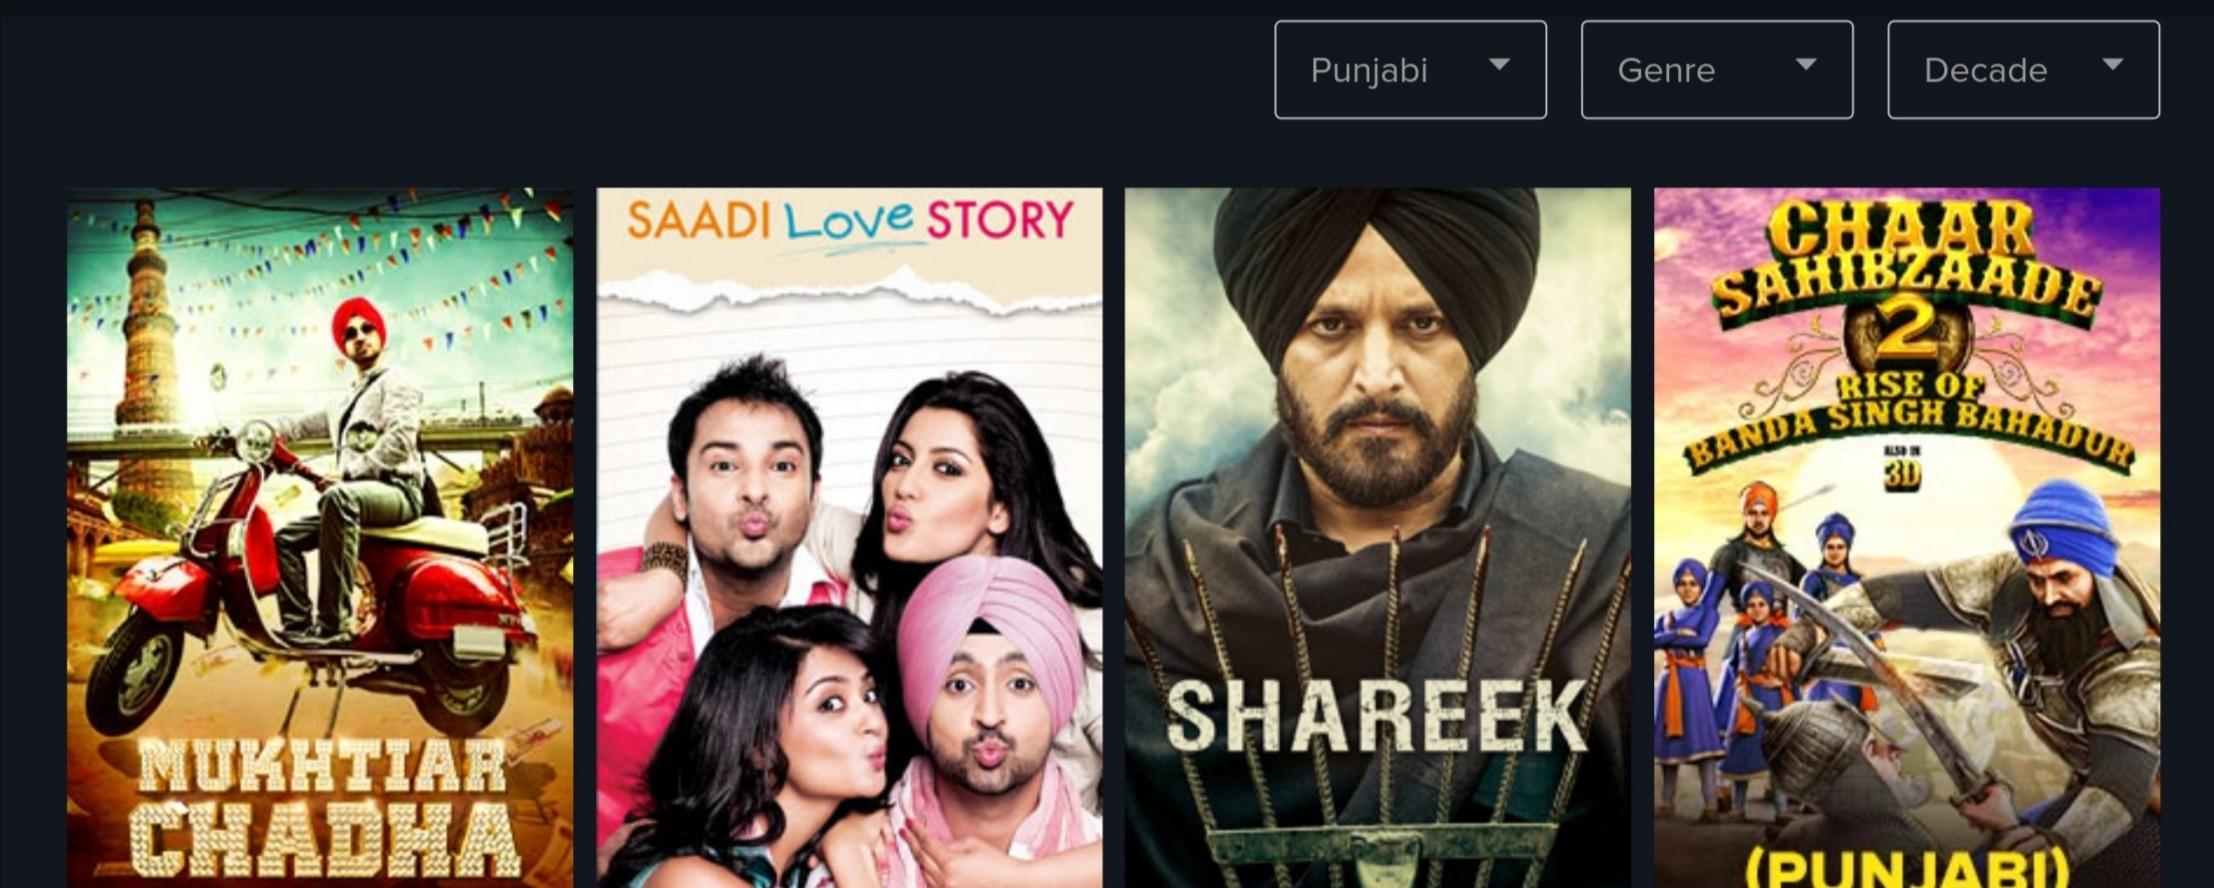 where to watch punjabi movies online